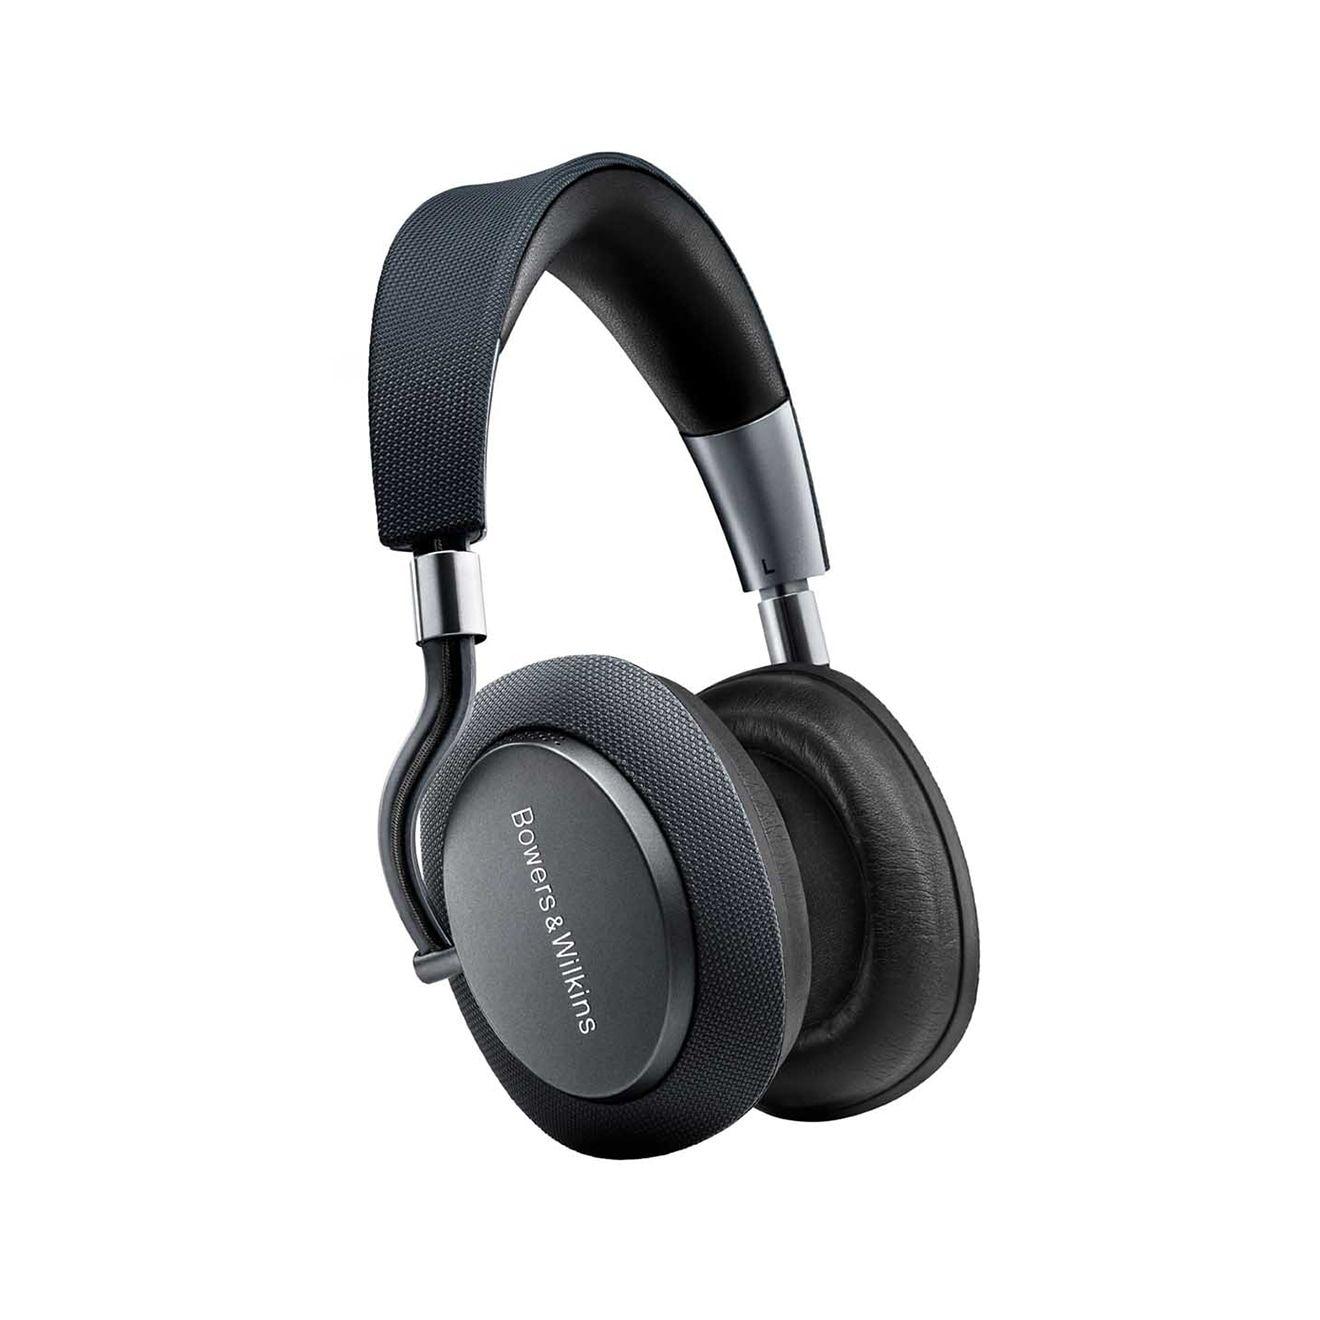 1-1-d-px-headphones-space-grey-a-teaser.jpg